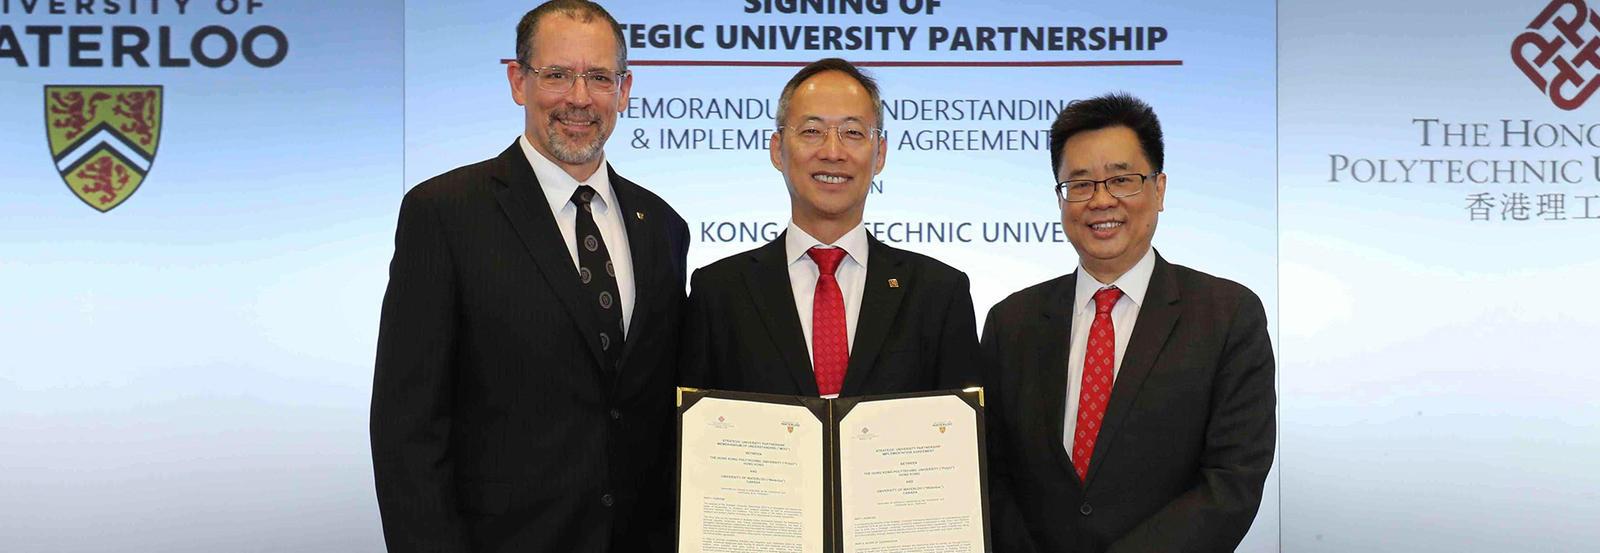 Dean Lemieux with Hong Kong partners